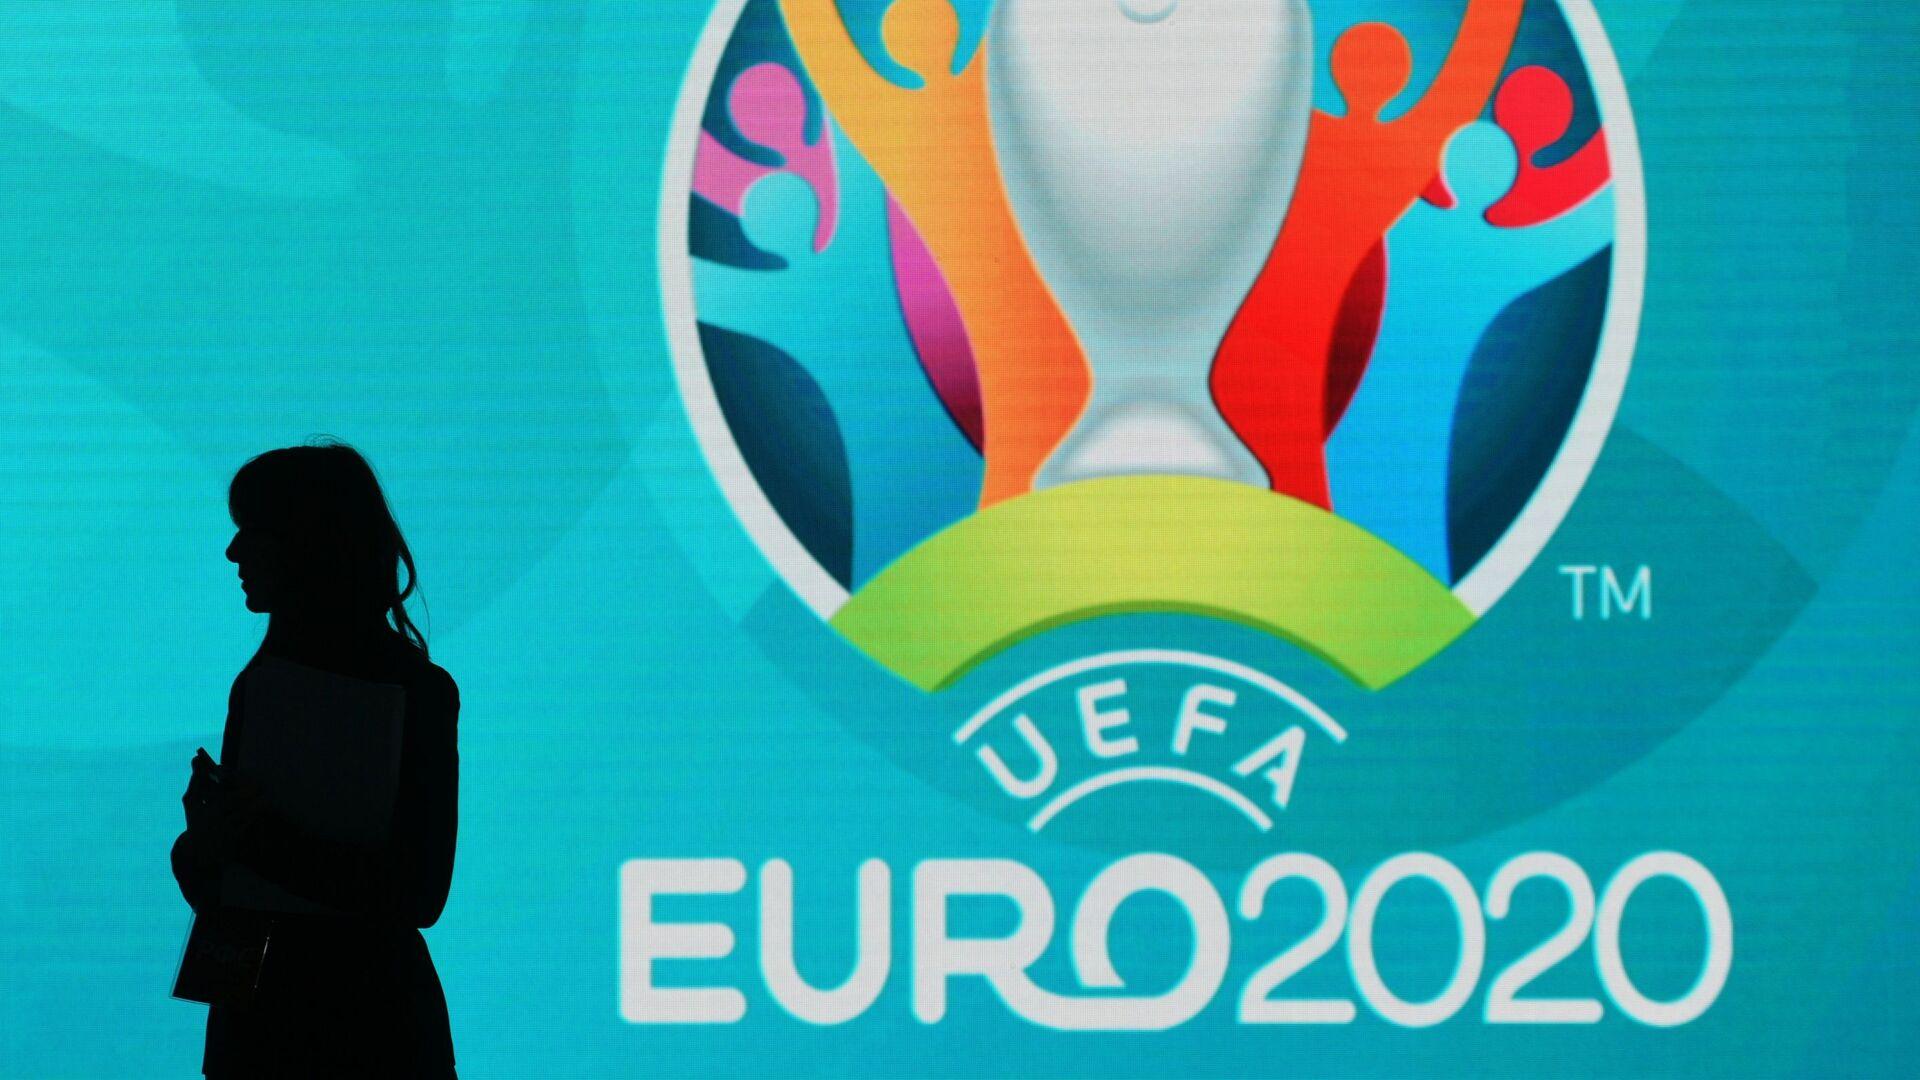 UEFA EURO 2020 - Sputnik Italia, 1920, 03.06.2021